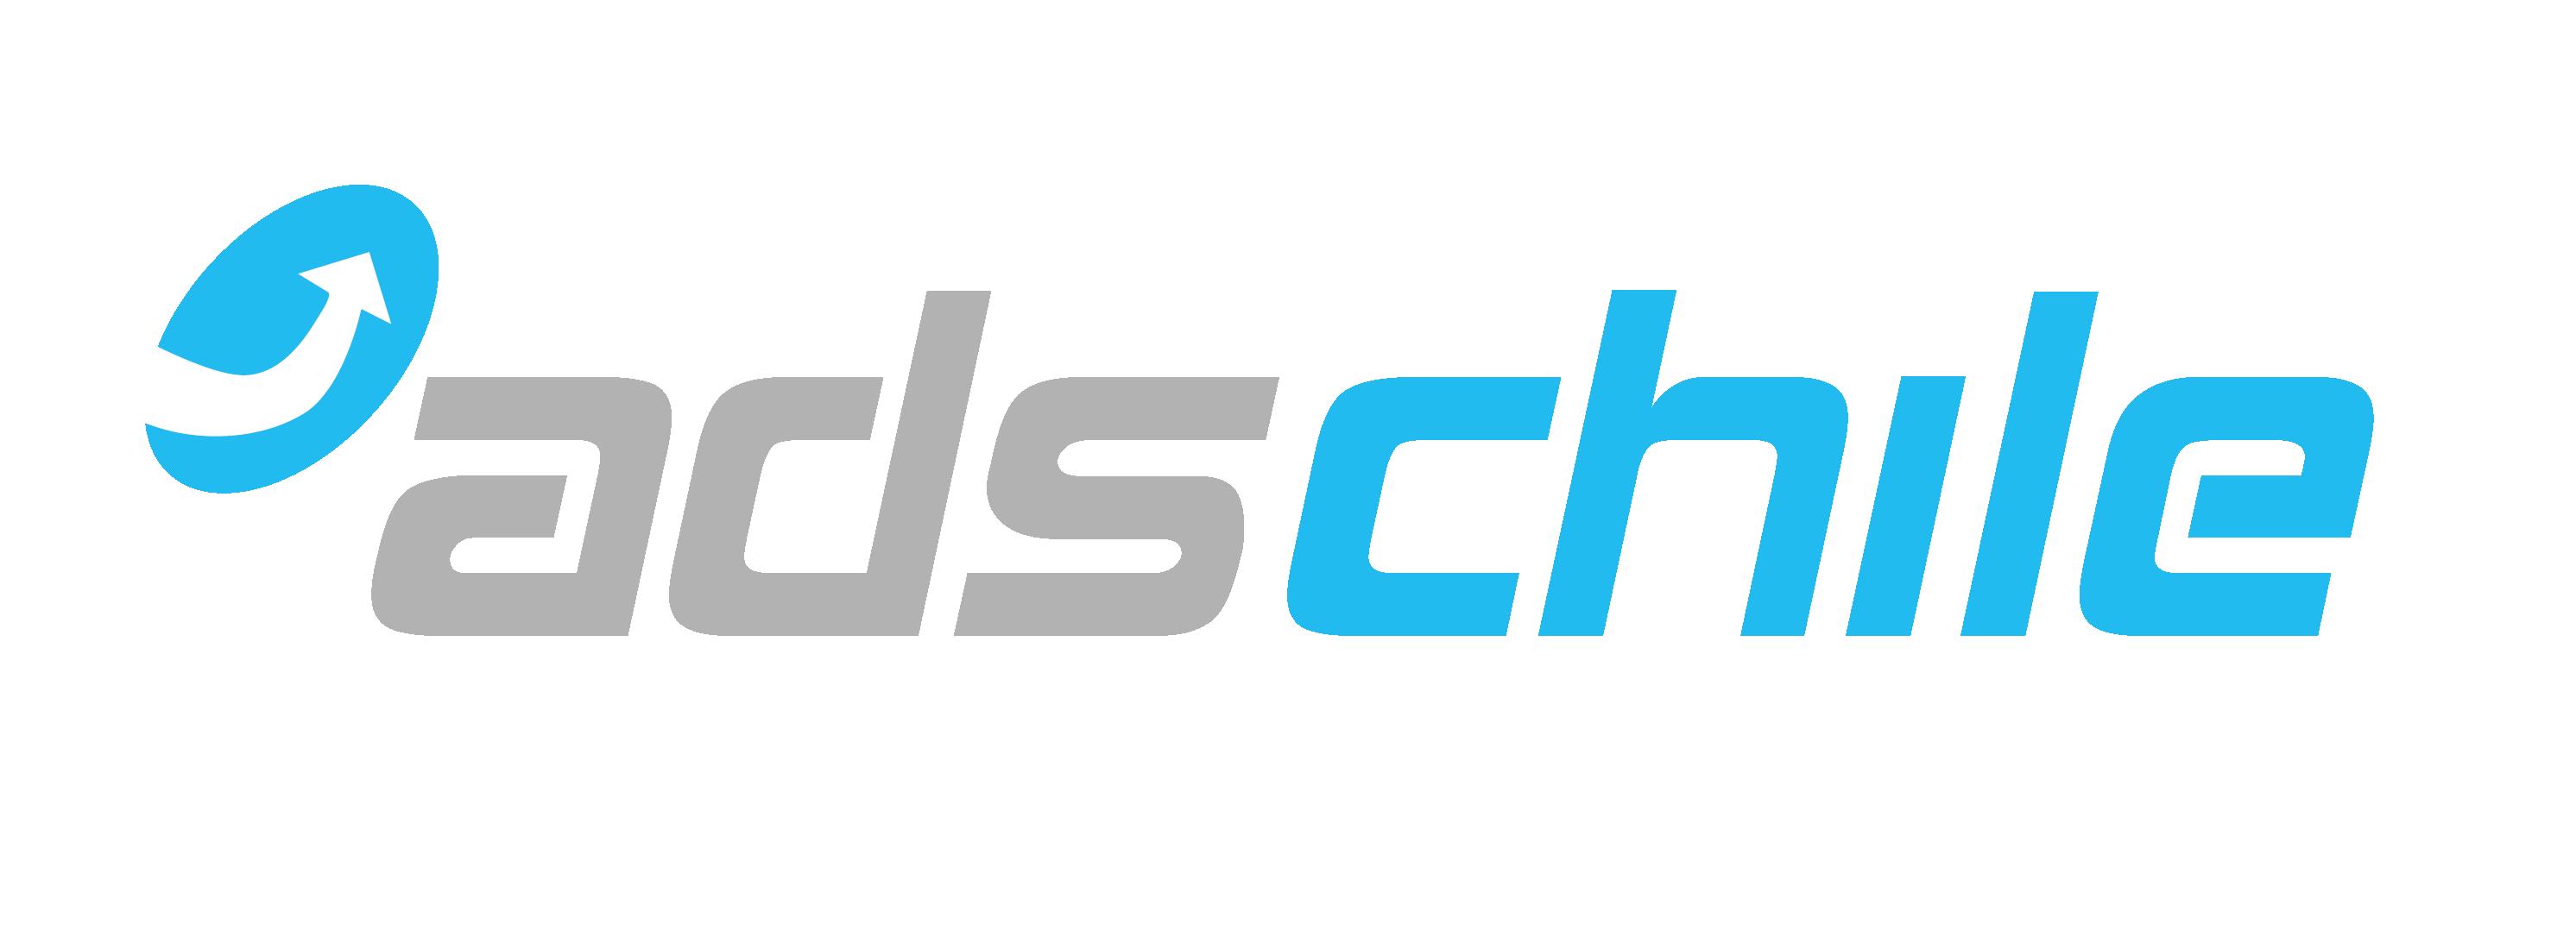 Logo ads 01 12f4722d 1c14 4a81 bd7c e1d2163d556a